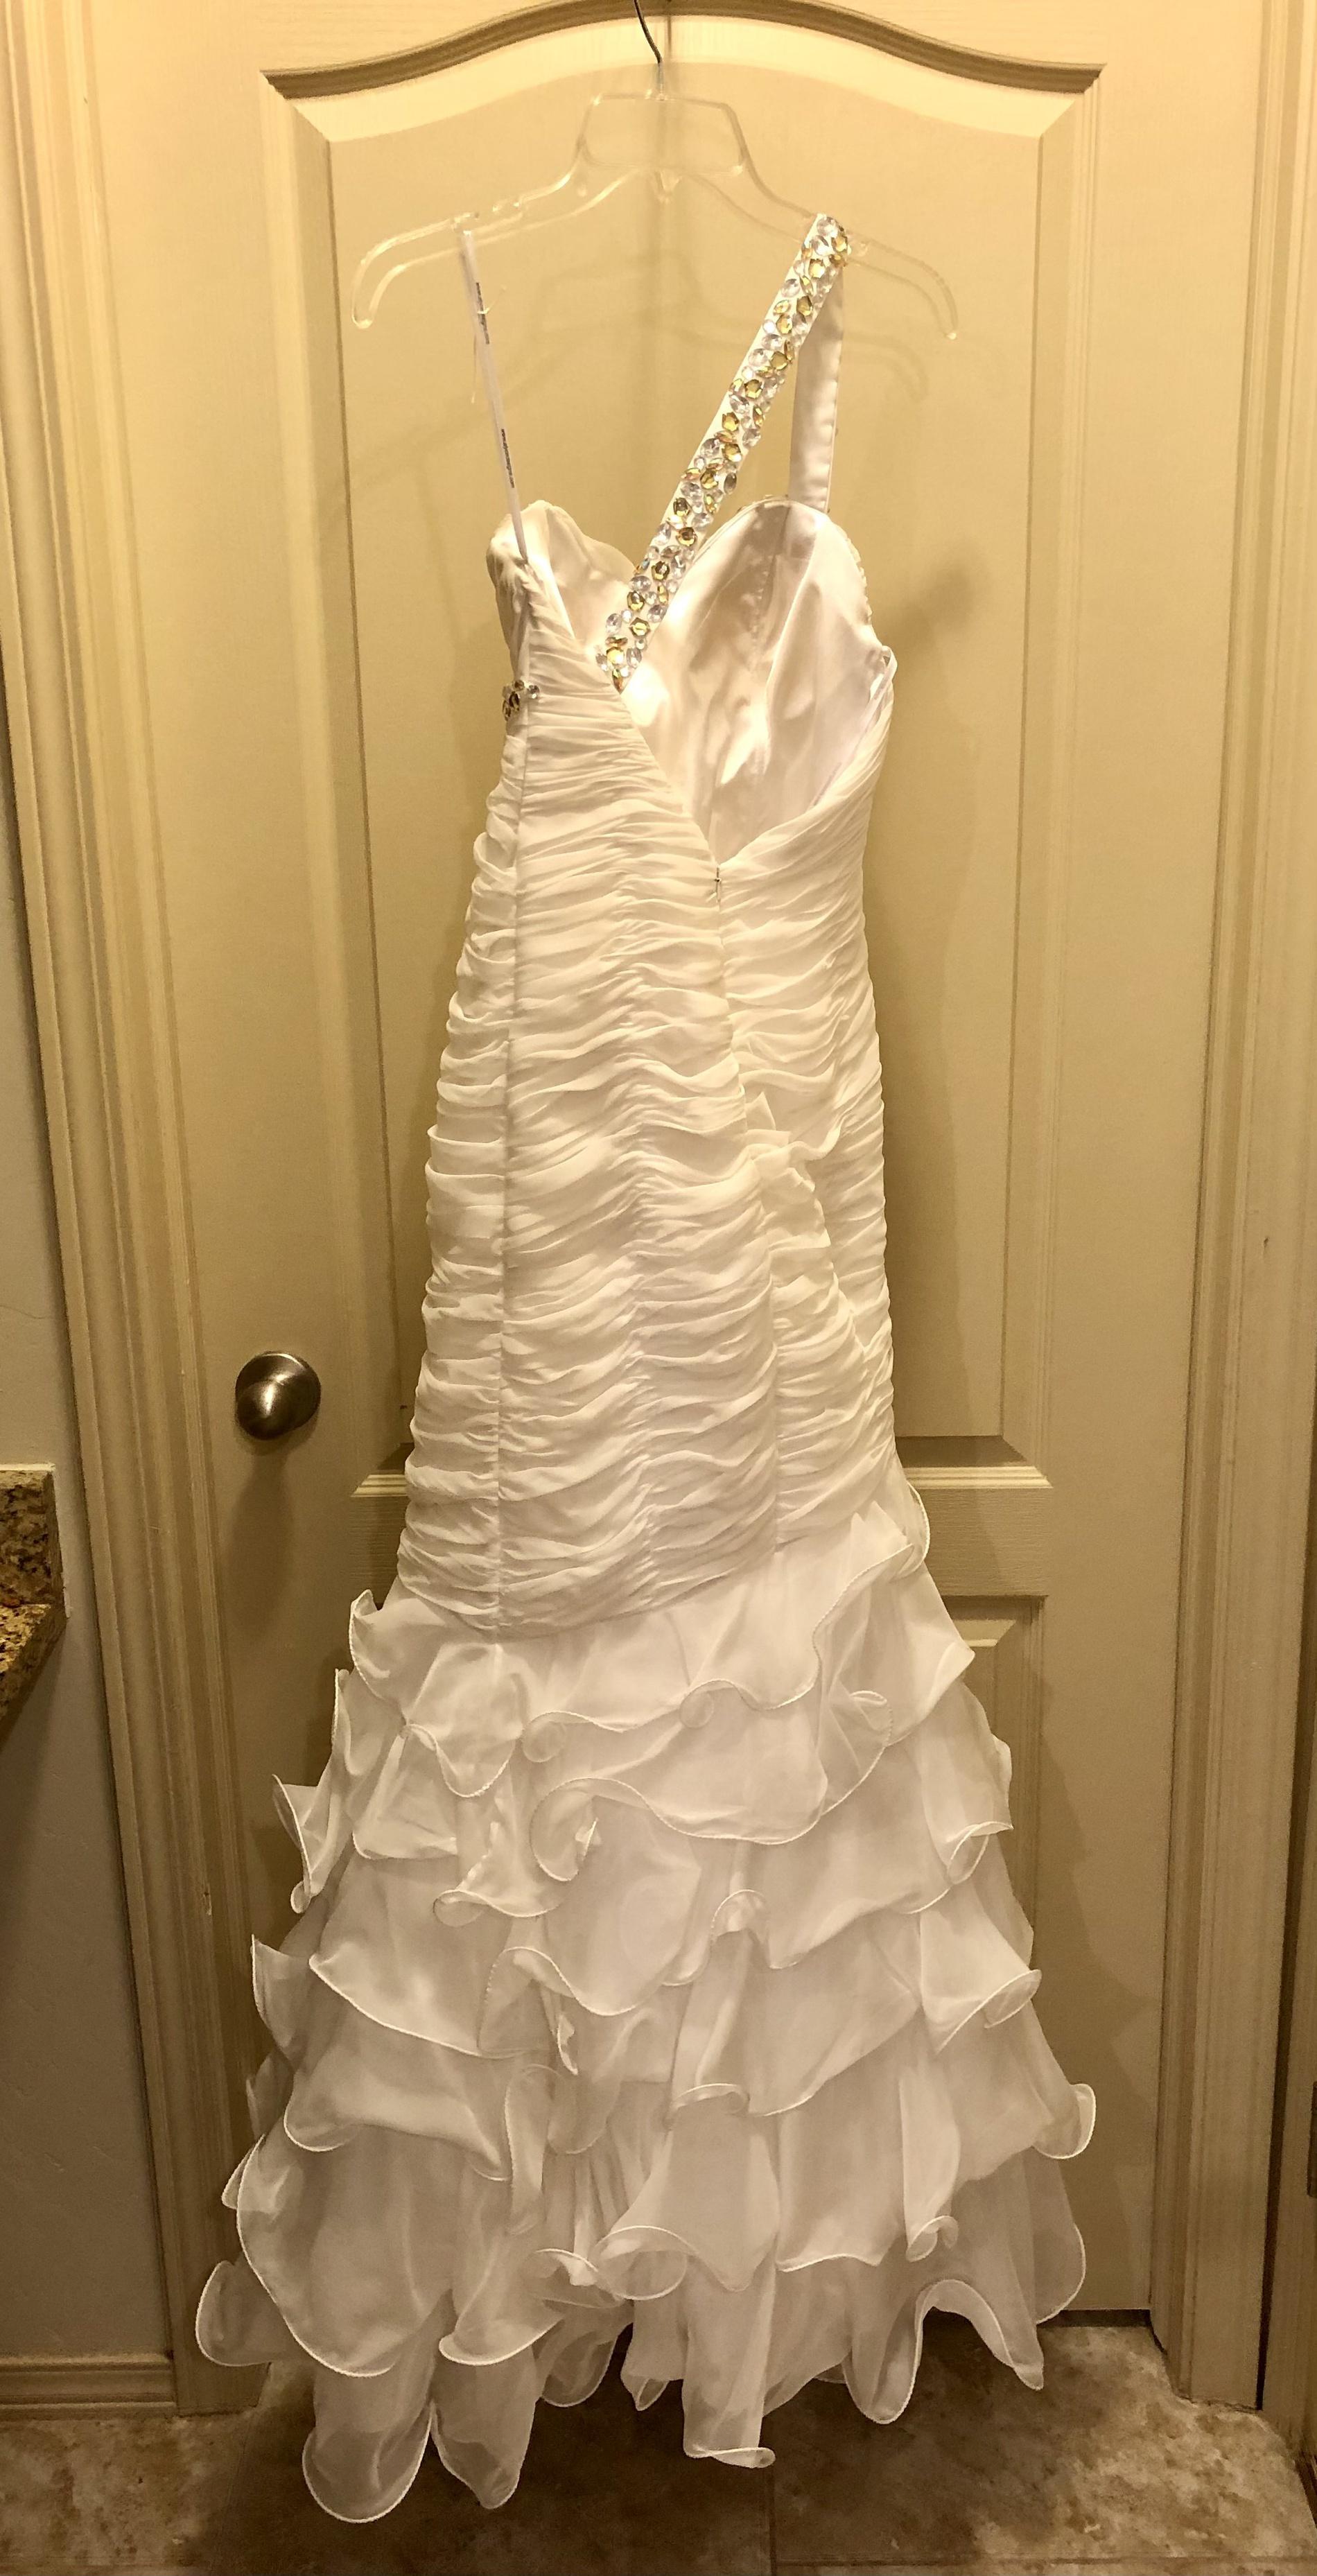 Alyce Paris White Size 4 Ruffles Wedding One Shoulder Jewelled Mermaid Dress on Queenly